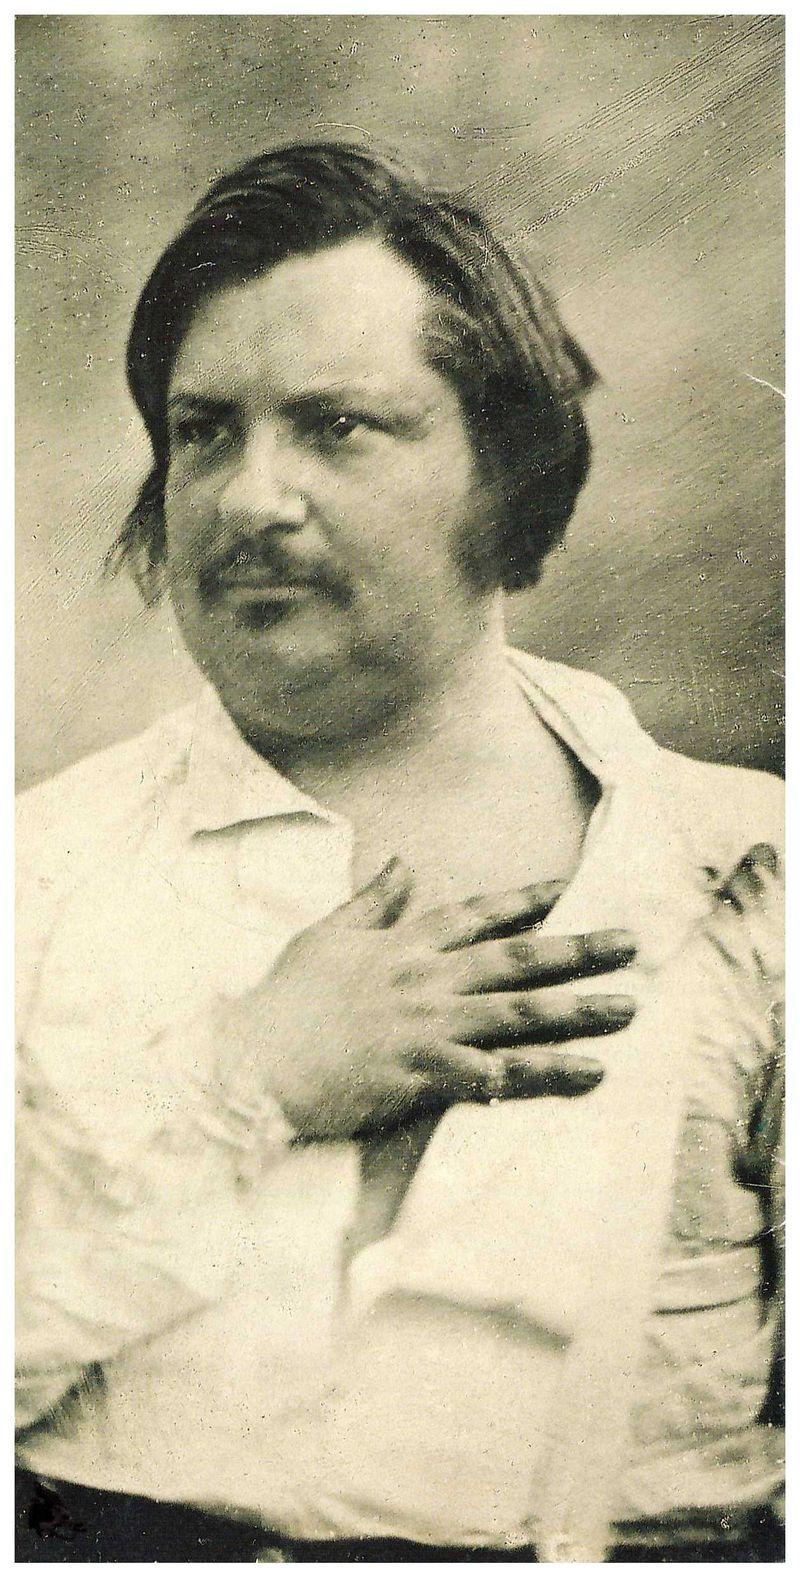 1. Balzac photo